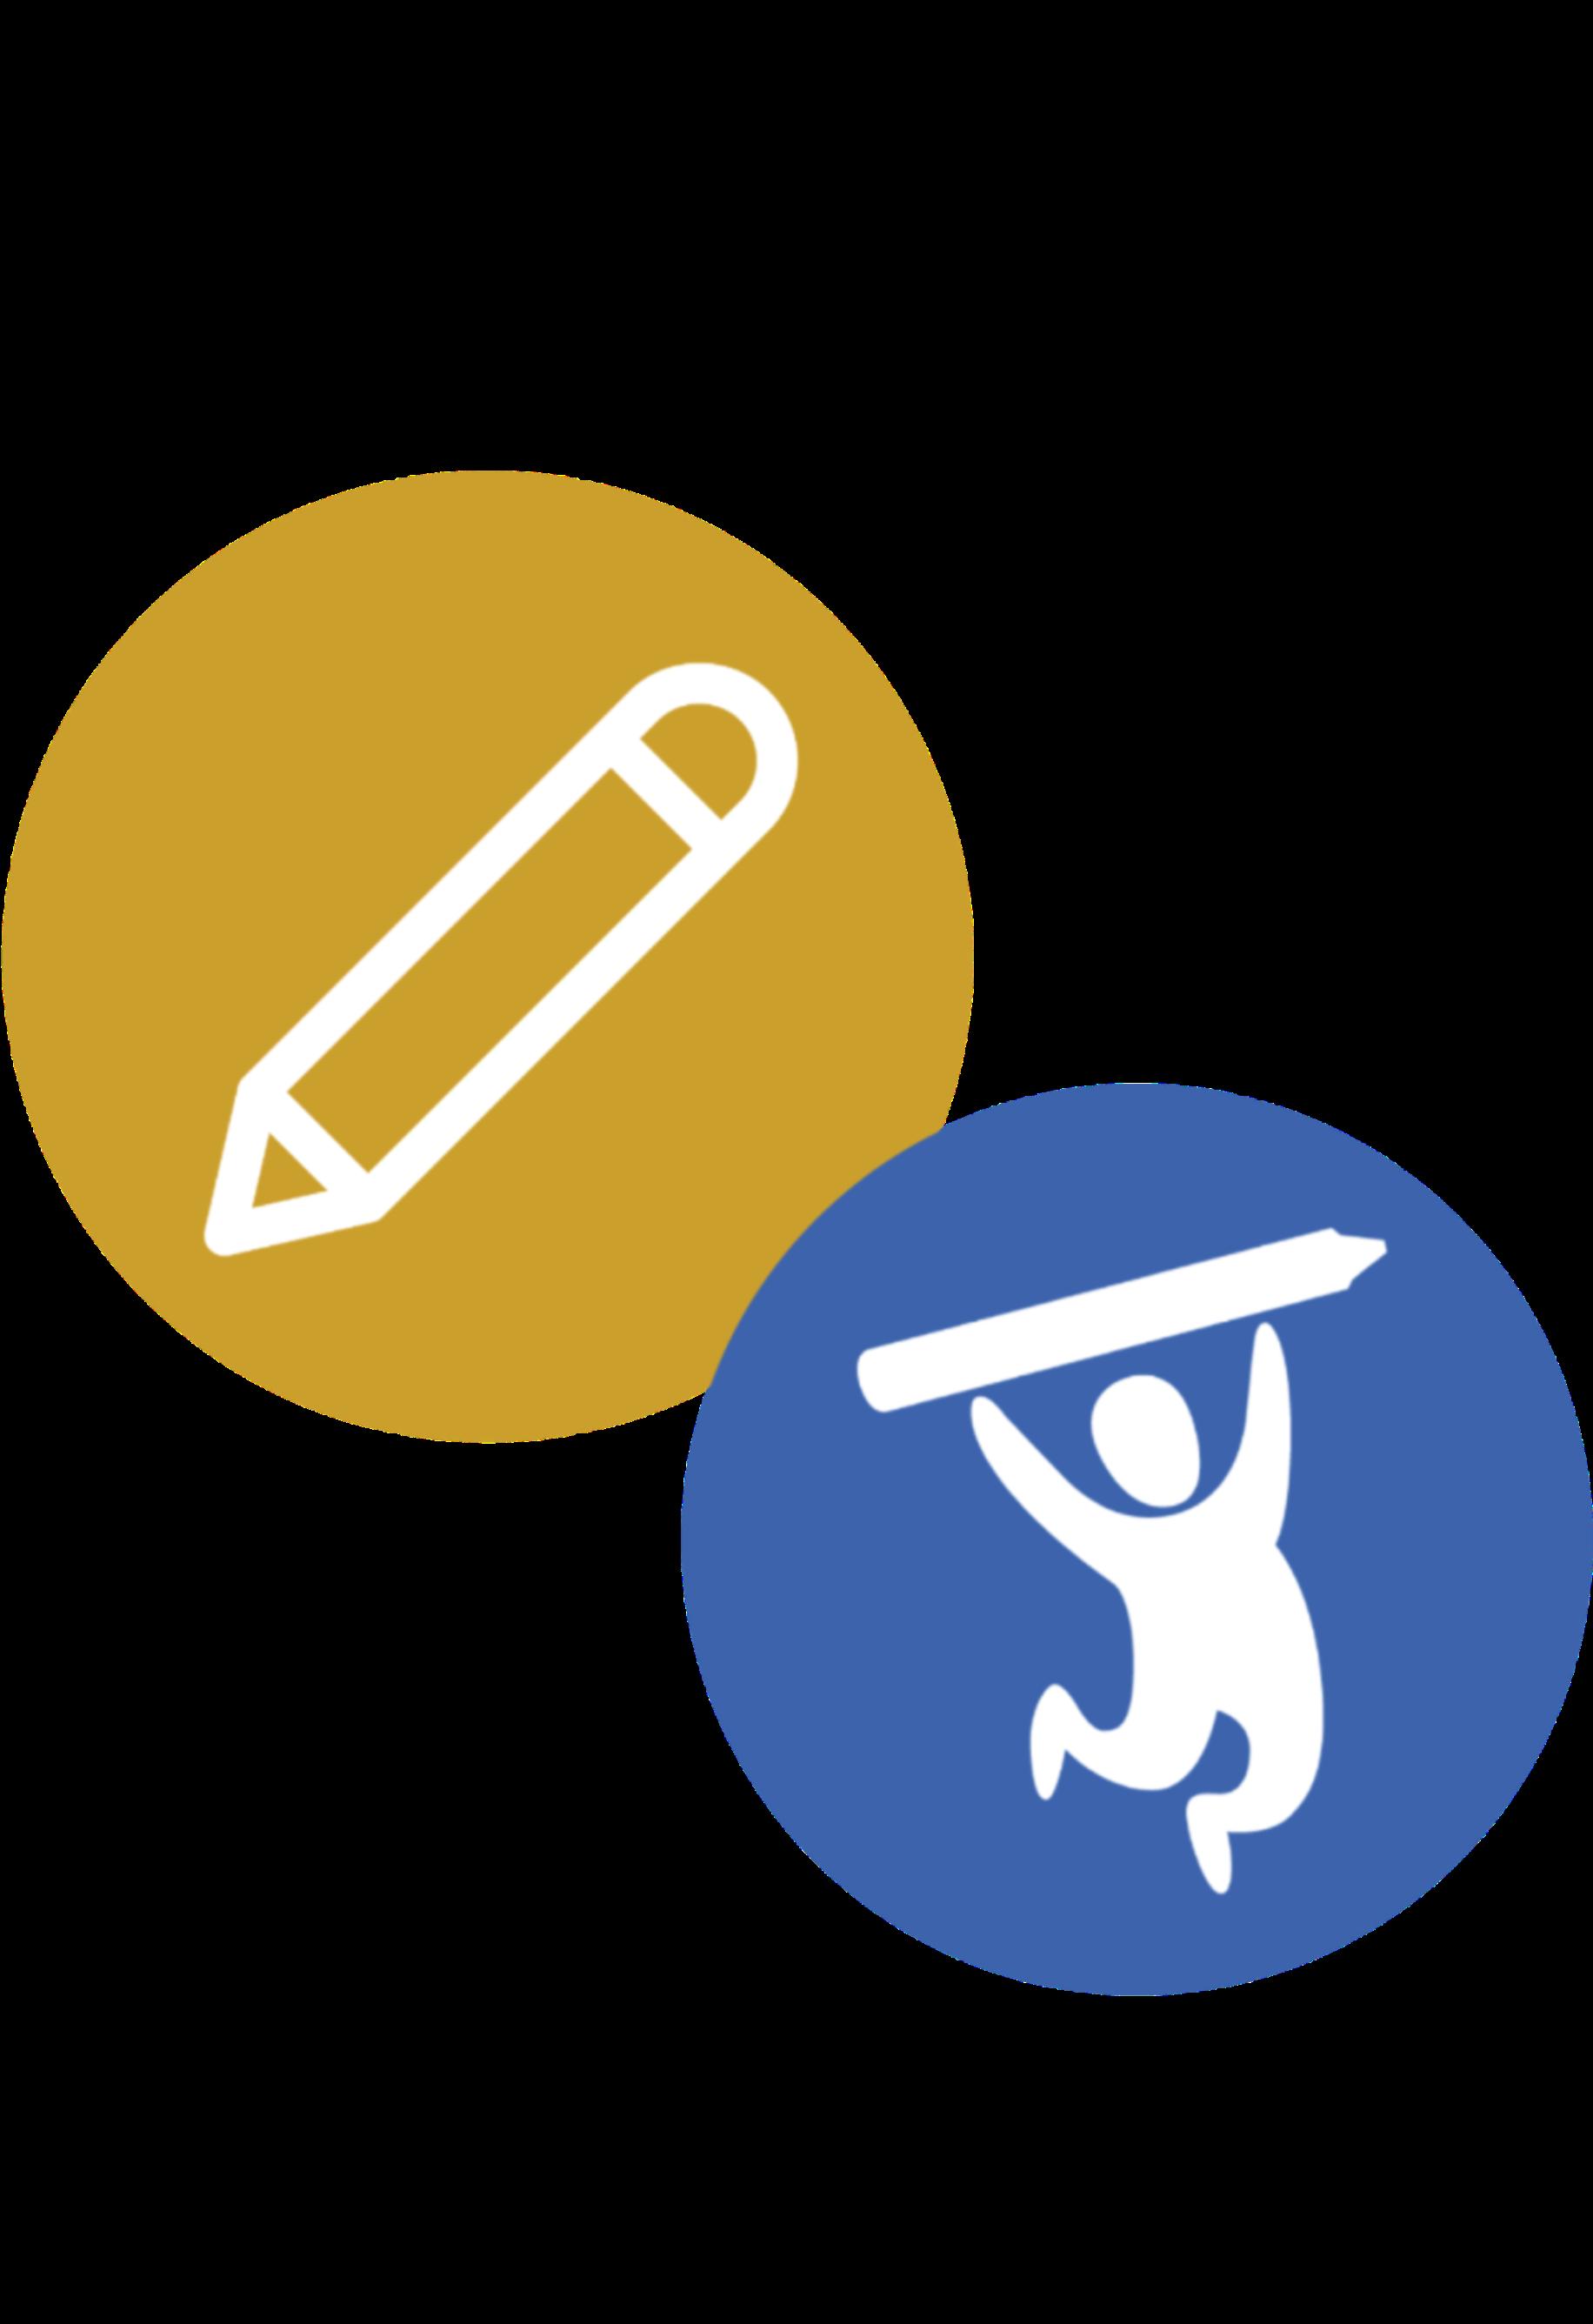 Pencil and School Tool Box Logo